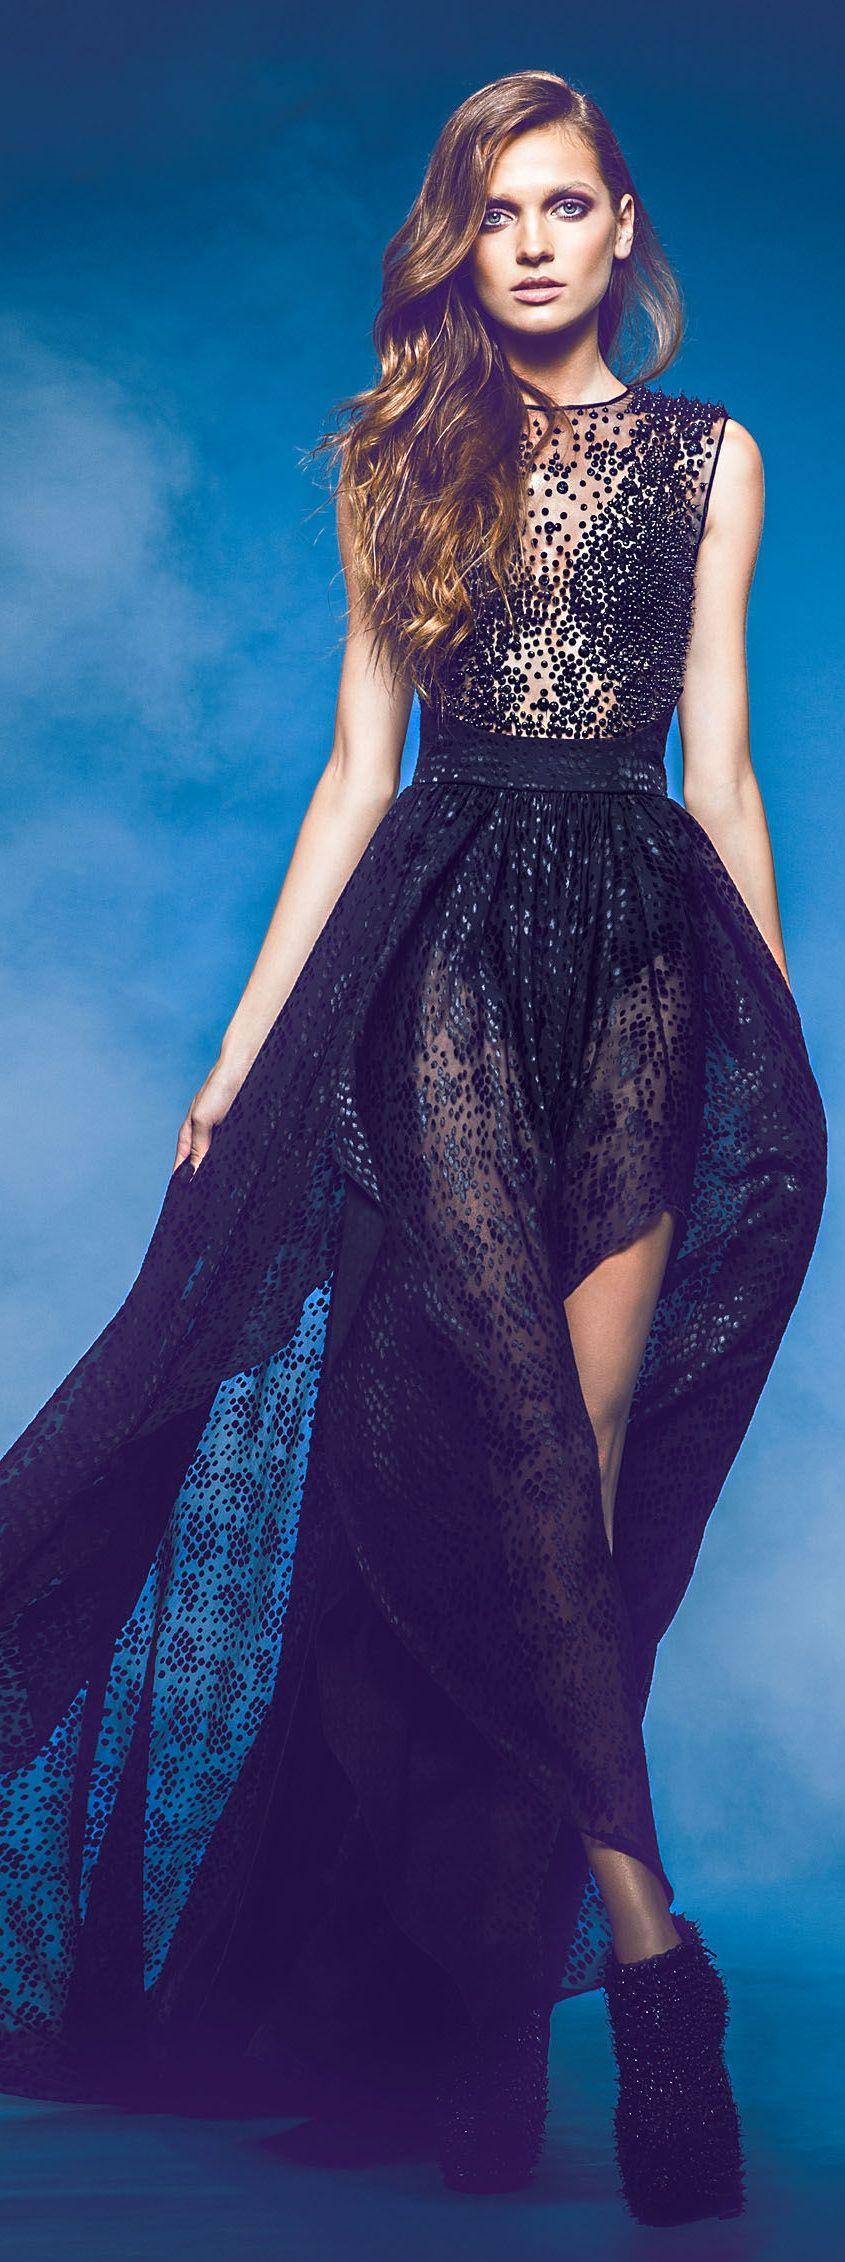 Jean louis sabaji couture fw plus beautiful dresses